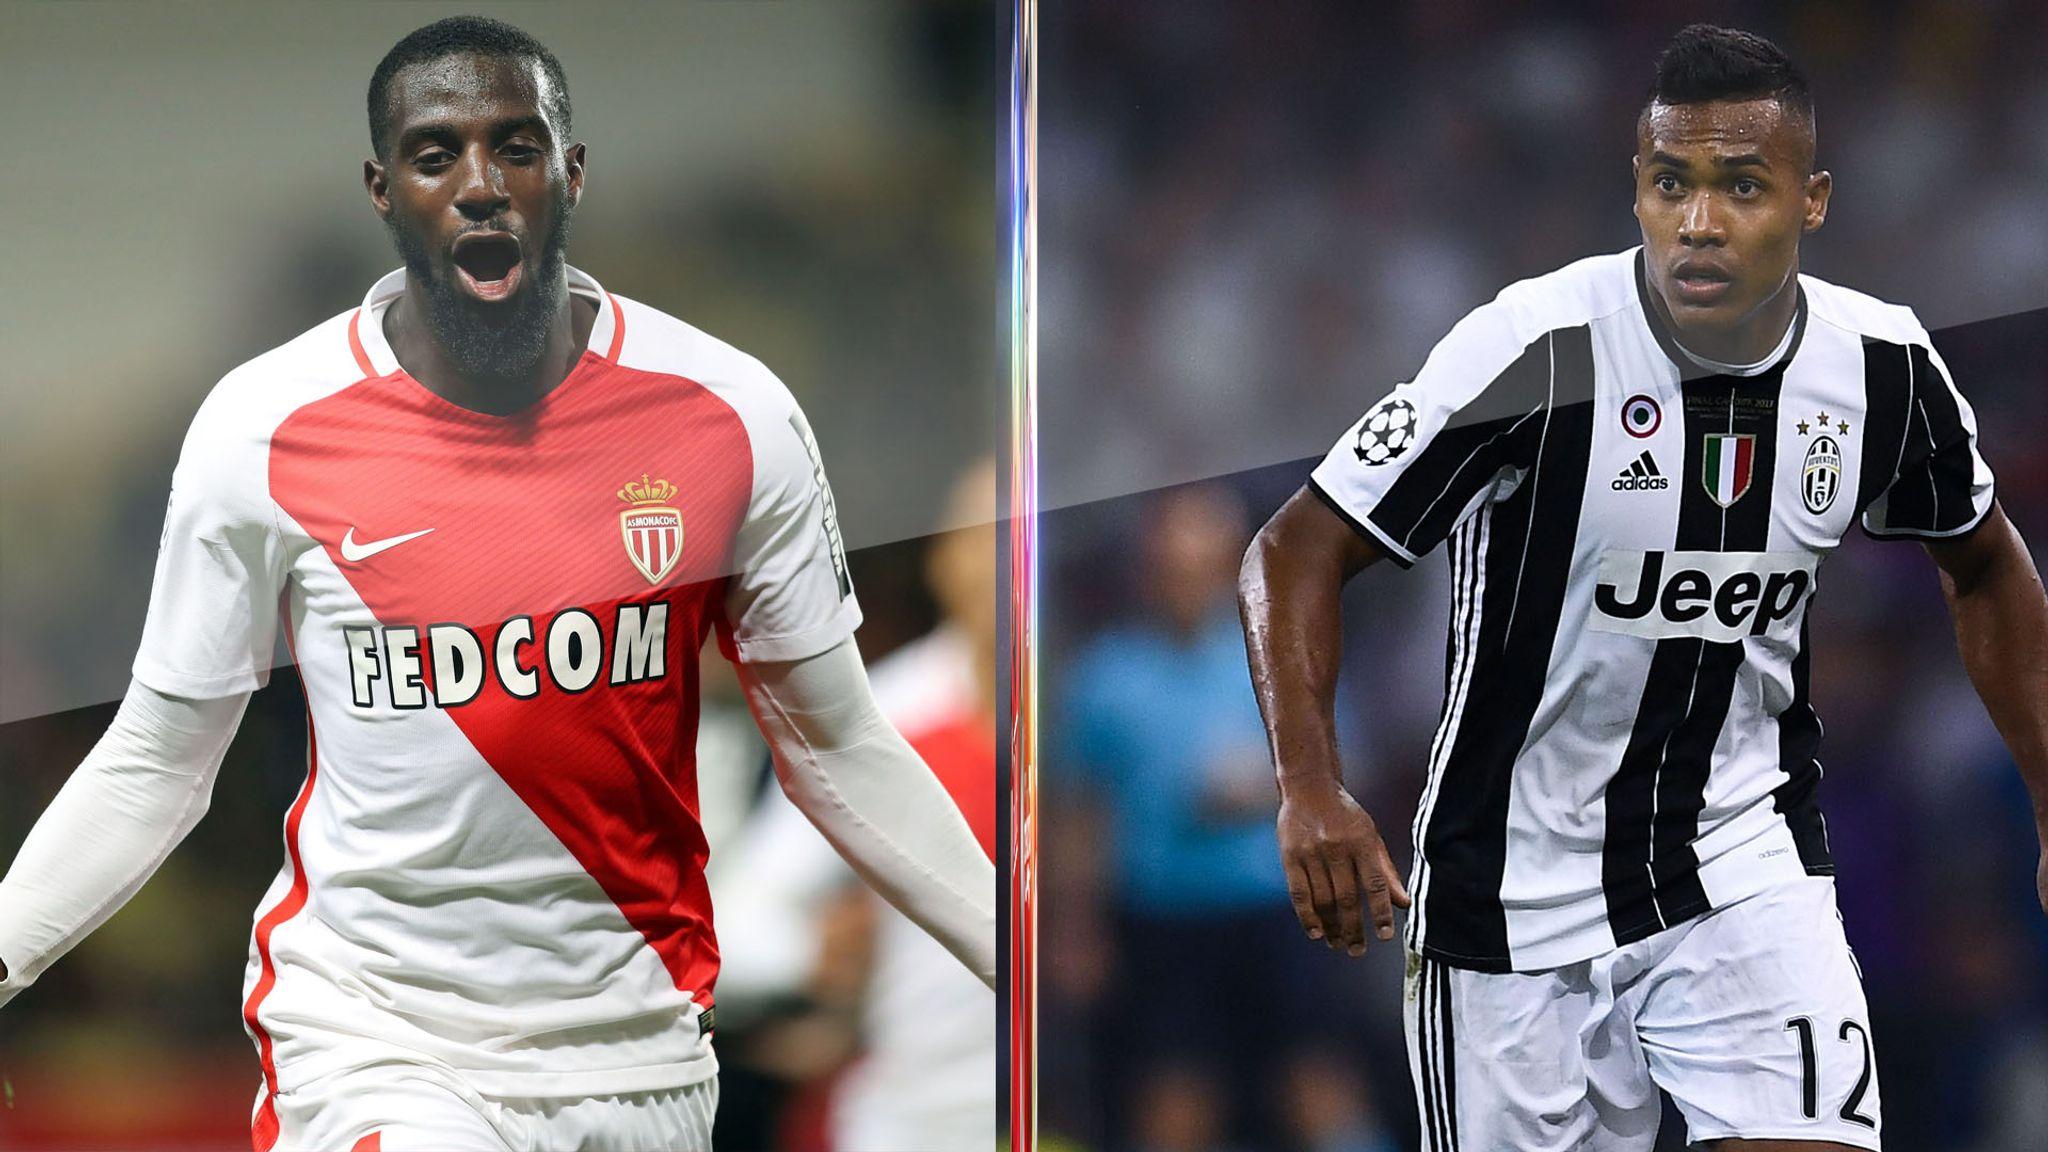 wholesale dealer 27104 cc465 Chelsea in talks to sign Tiemoue Bakayoko and Alex Sandro ...